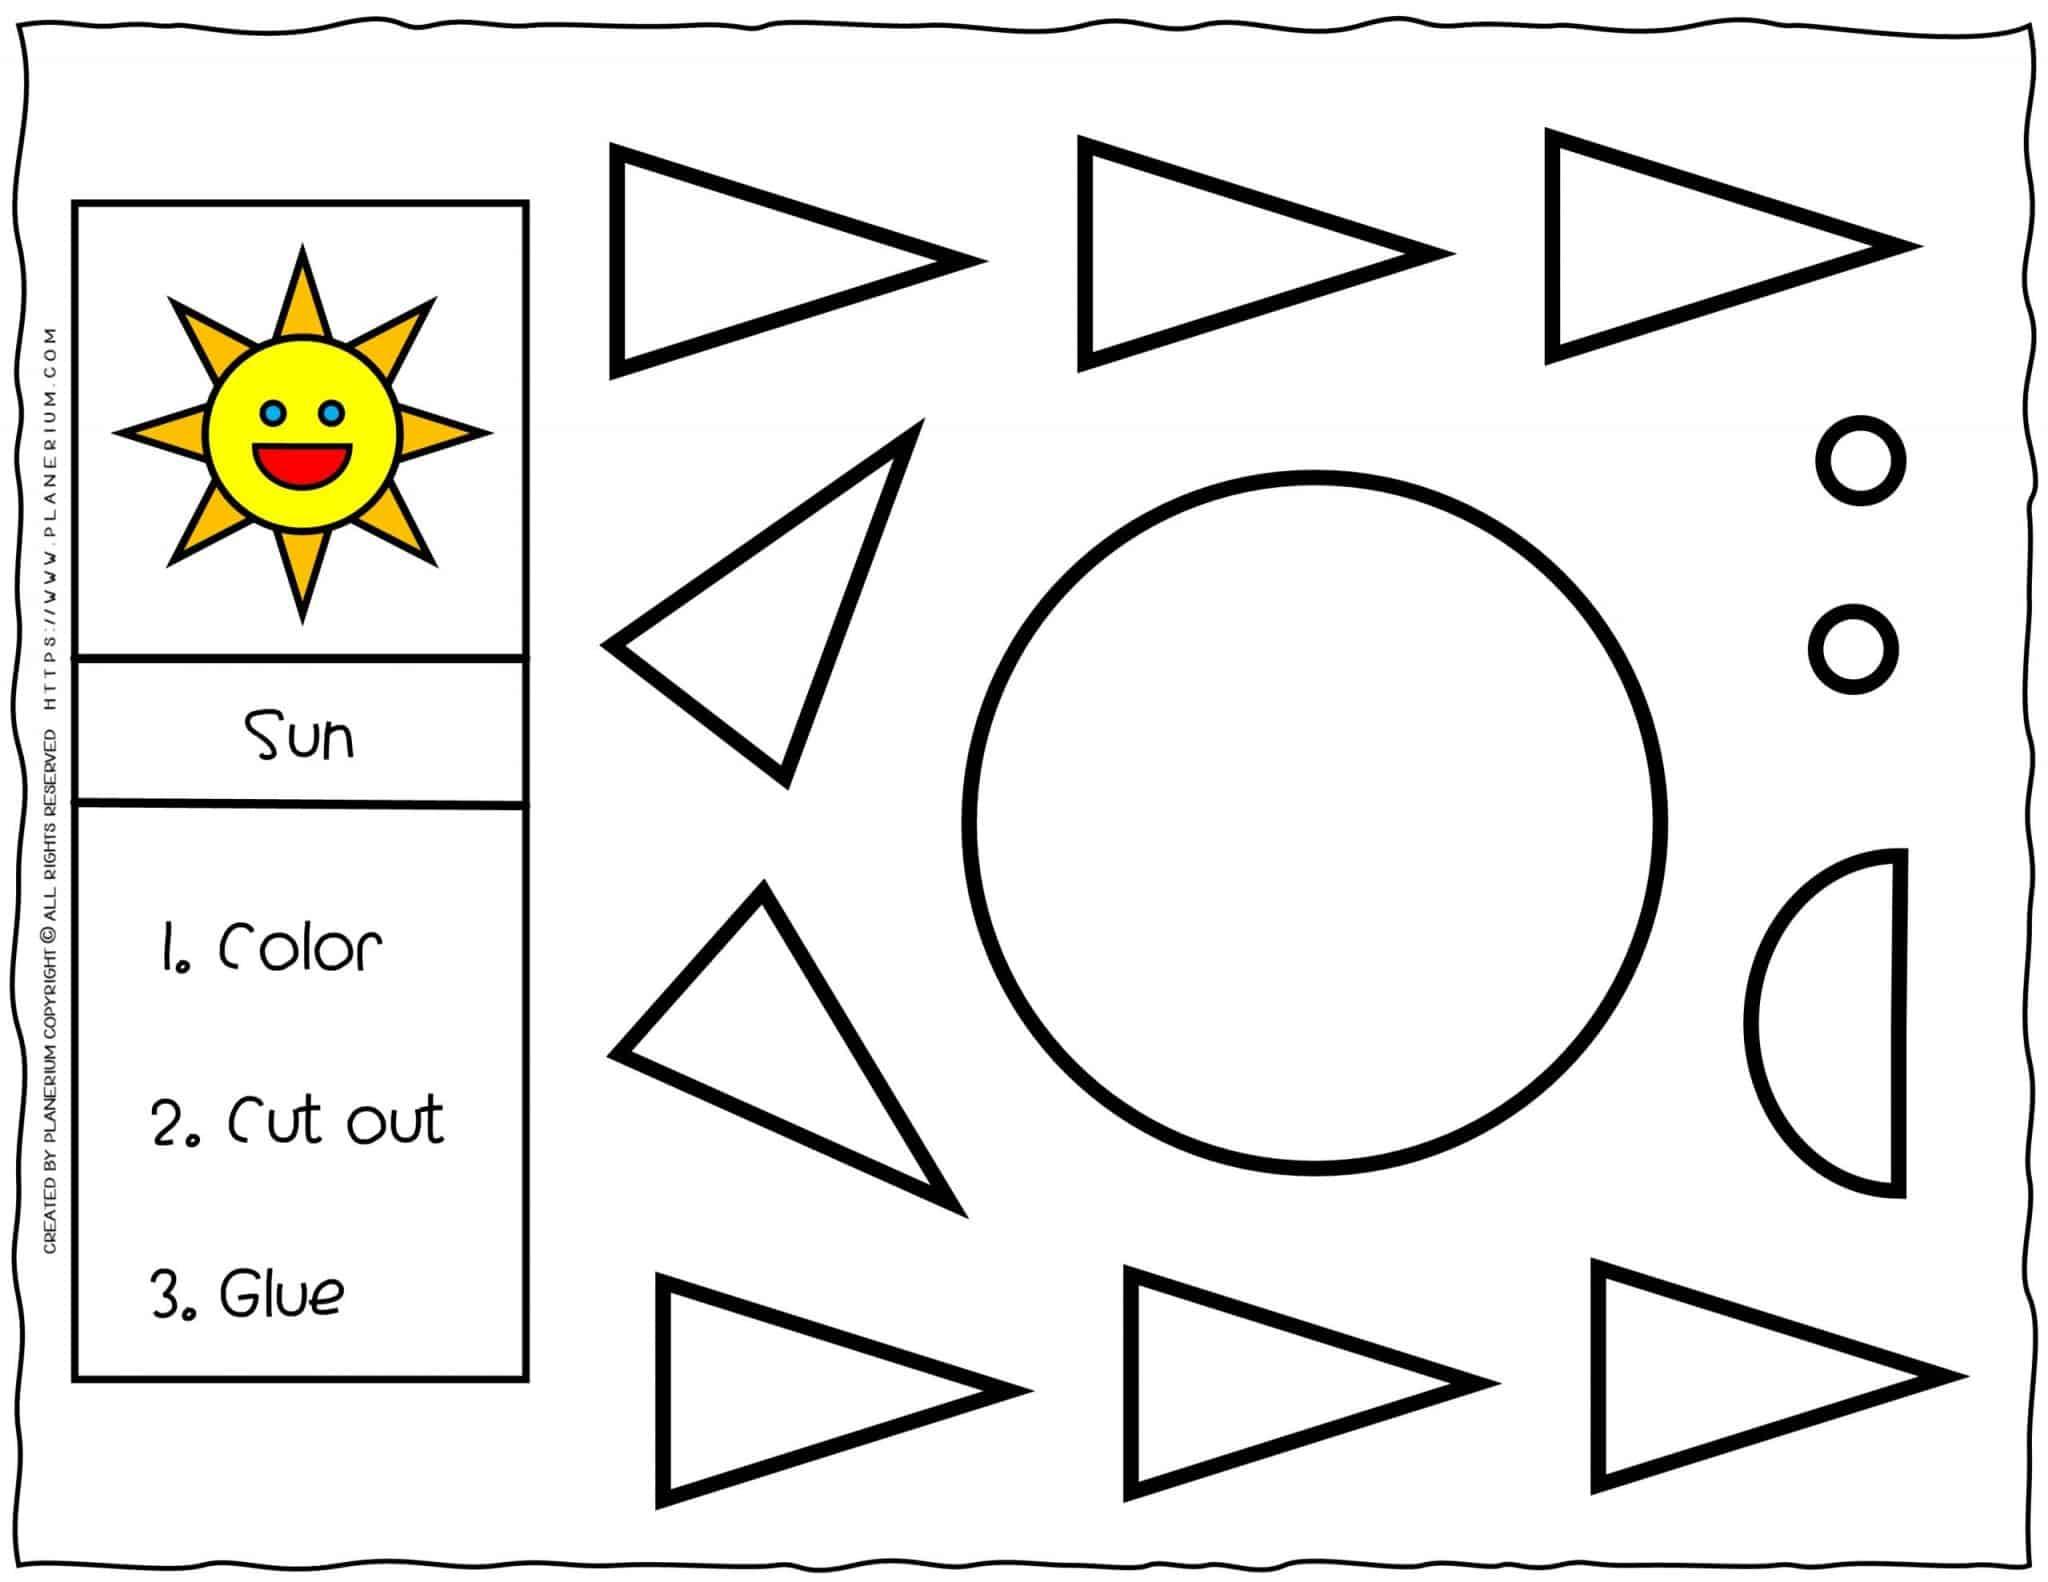 Cut and Glue Worksheet - Sun | Planerium